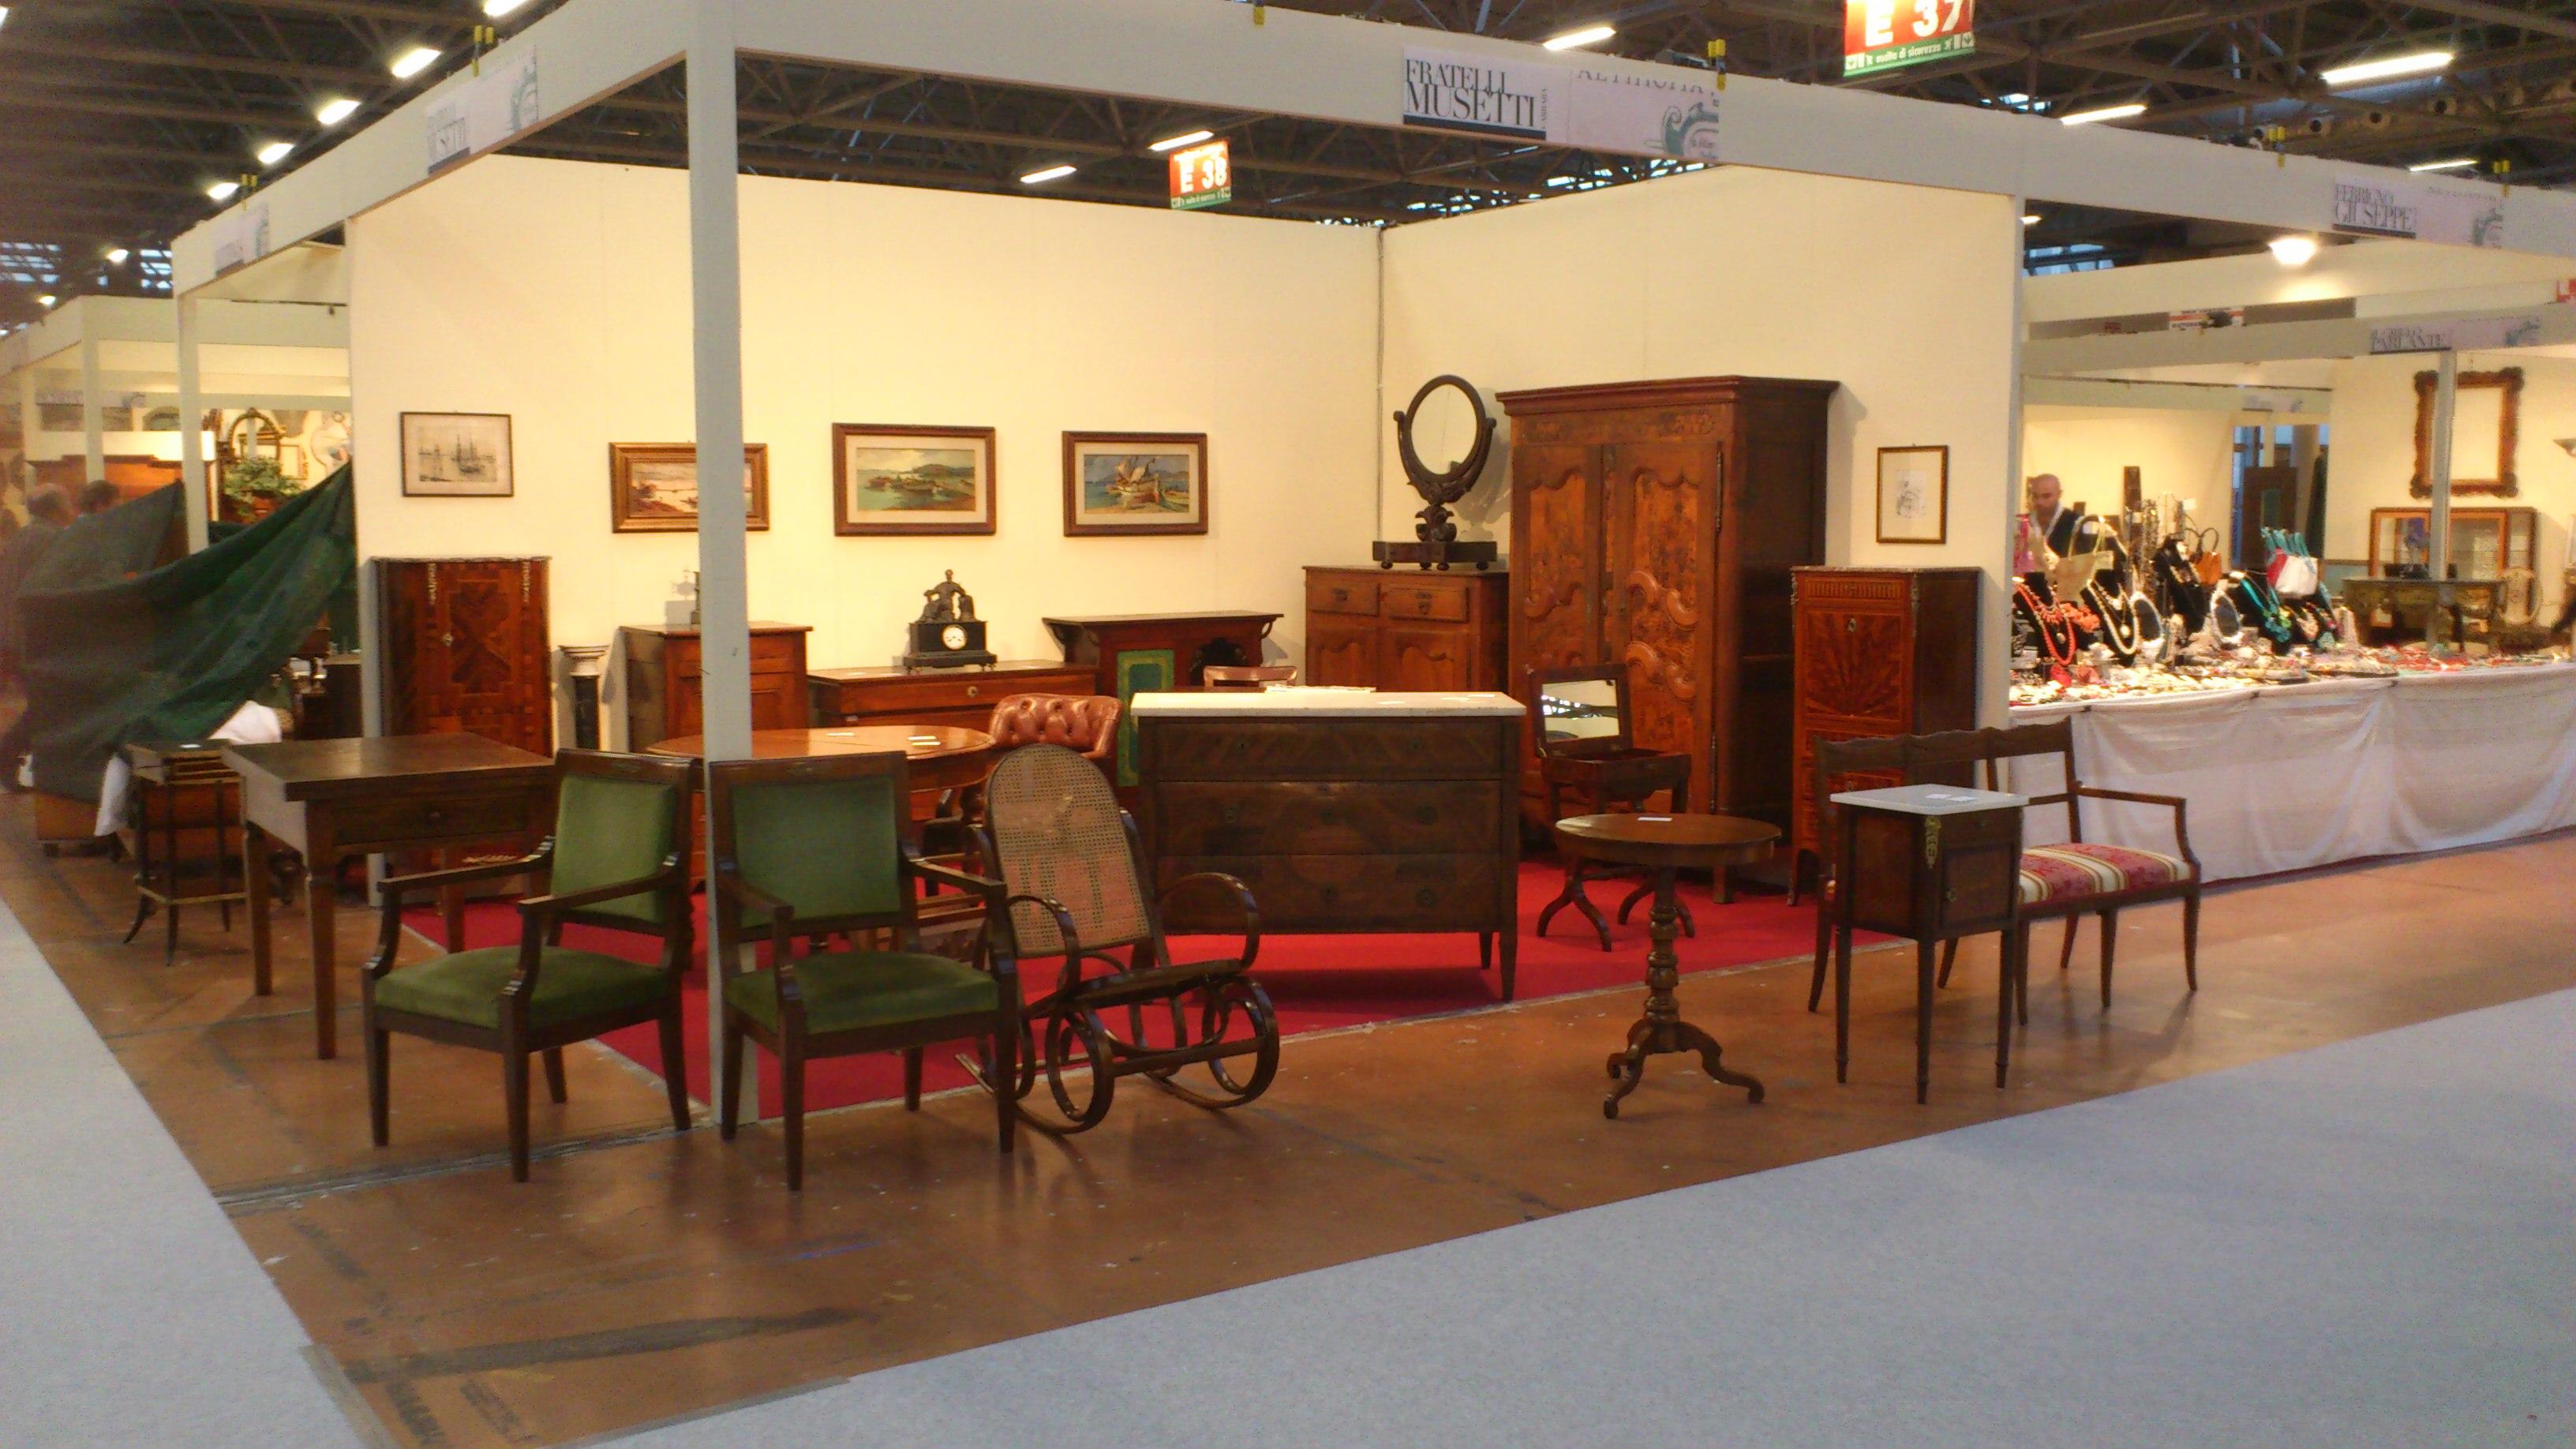 Musetti mobili antichi vendita e restauro mobili antichi for Svendite mobili